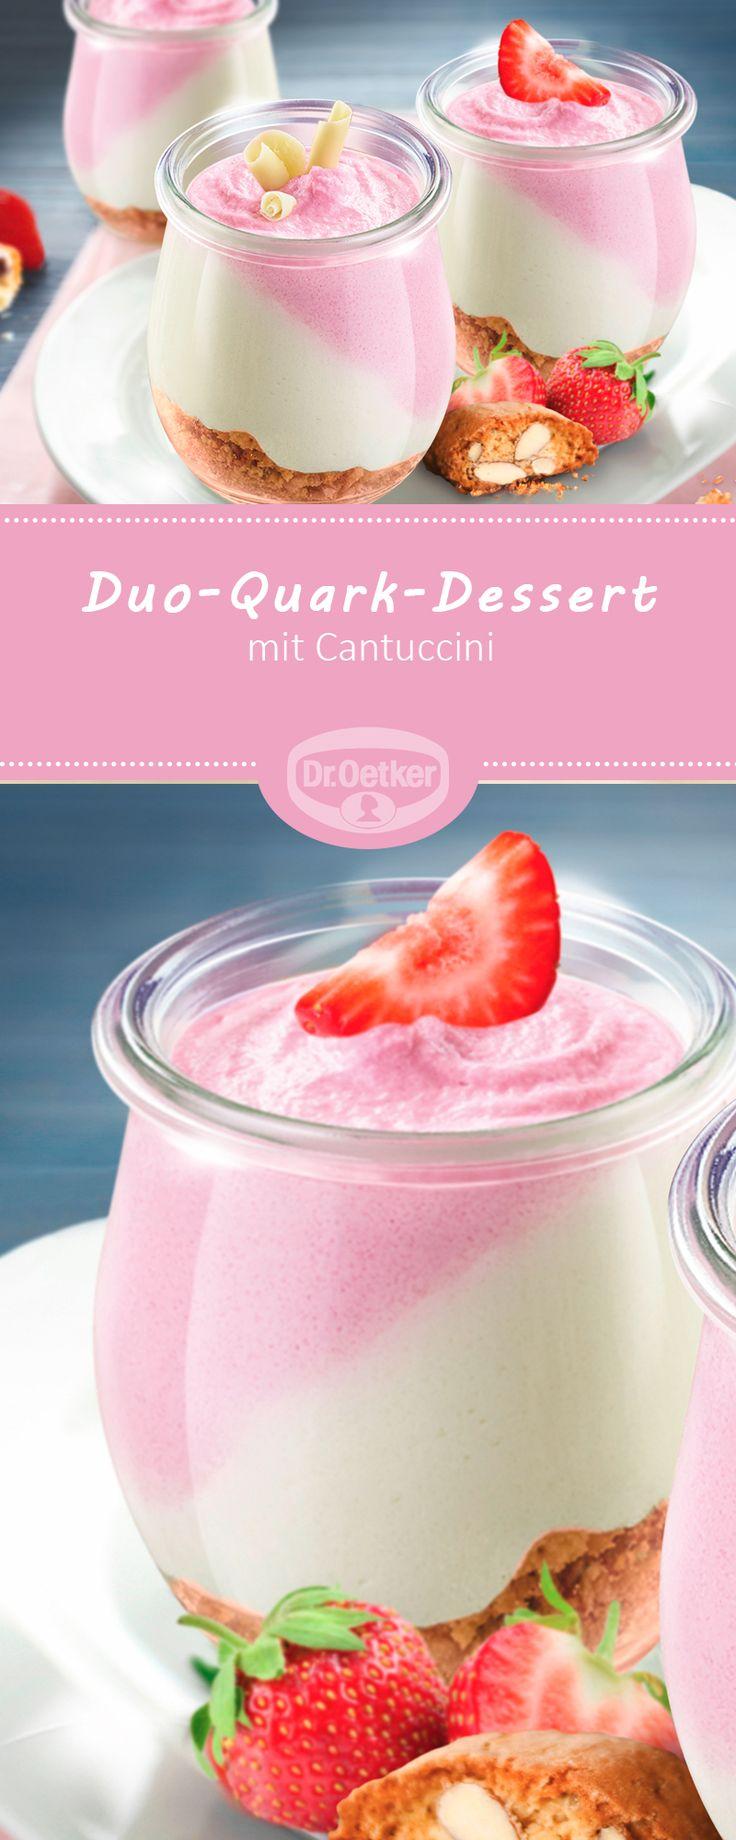 Duo-Quark-Dessert - Fruchtiges Dessert mit Cantuccini #dessert #rezept #strawberry